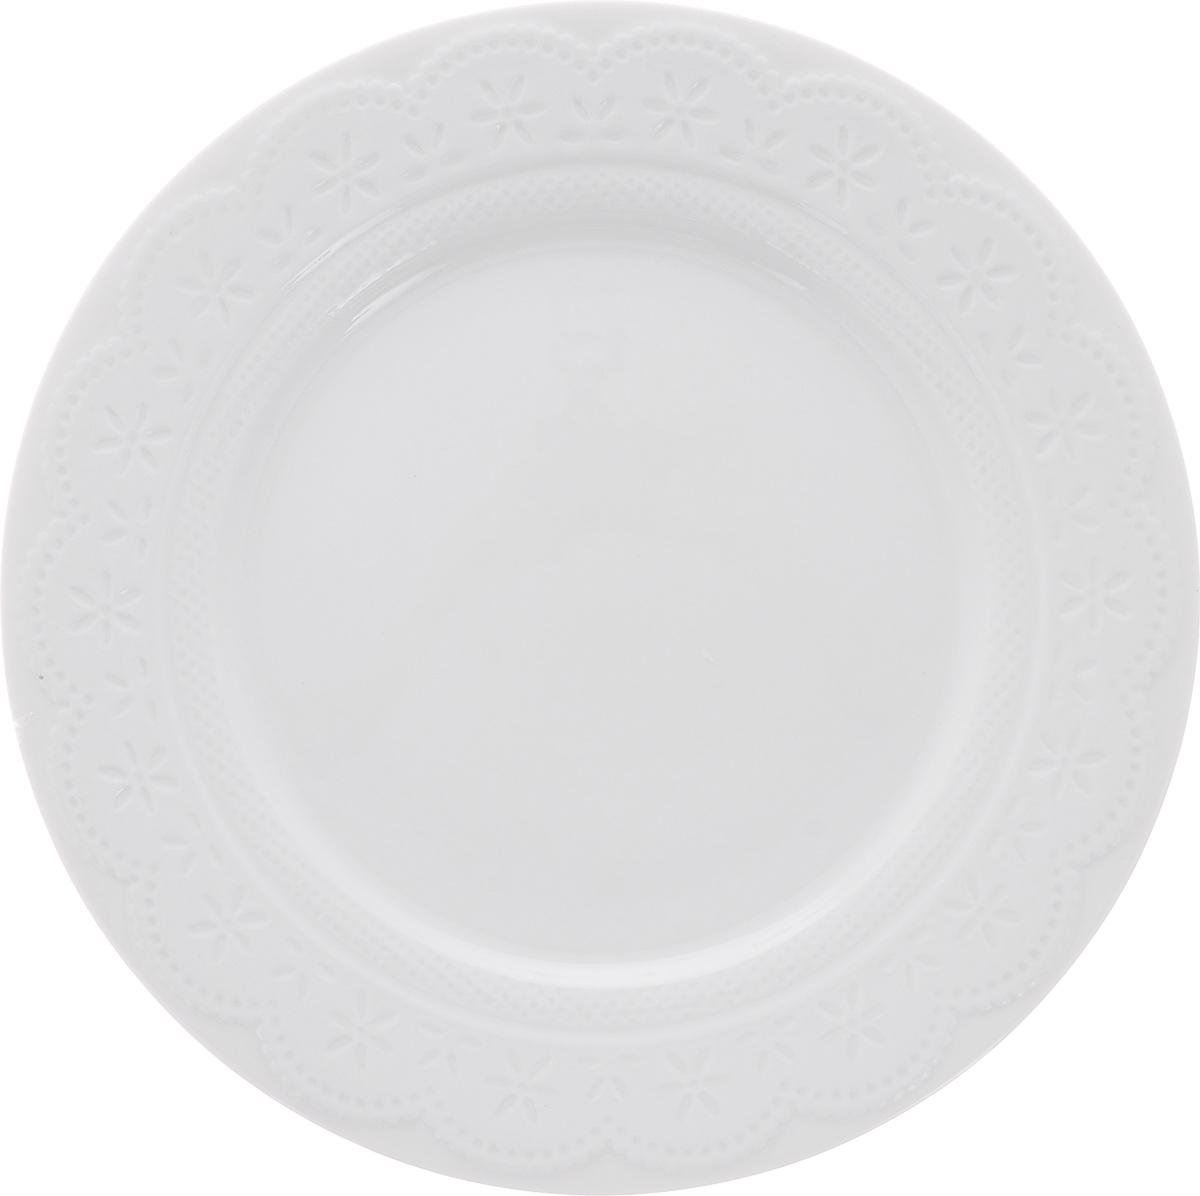 Тарелка обеденная Walmer Charlotte, цвет: белый, диаметр 26 см тарелка обеденная terracotta дерево жизни диаметр 26 см